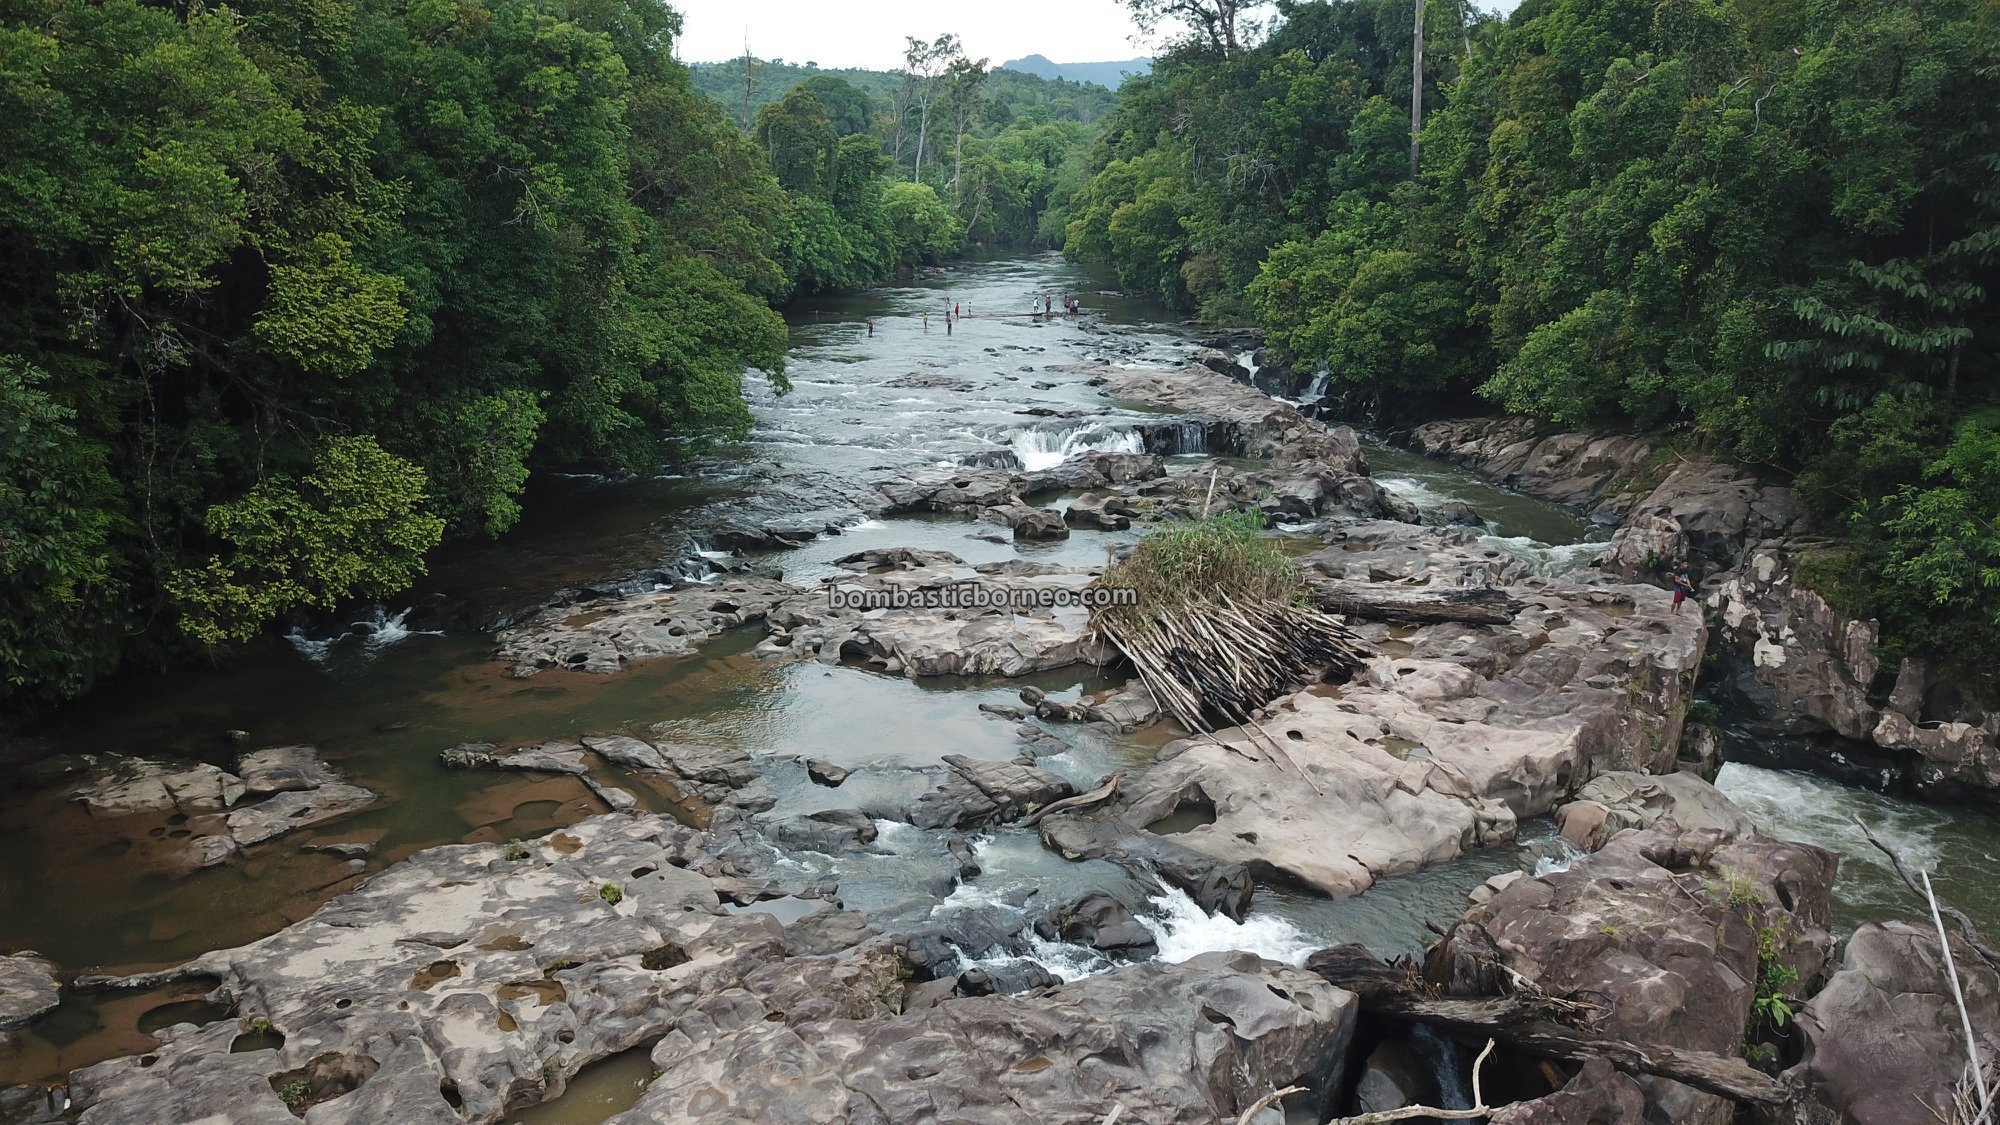 Air terjun, Dusun Simpang Empat, adventure, nature, outdoor, exploration, Desa Bengkawan, Seluas, Wisata Alam, Tourism, Trans Borneo, backpackers, 跨境婆罗洲游踪, 印尼西加里曼丹, 孟加映瀑布,